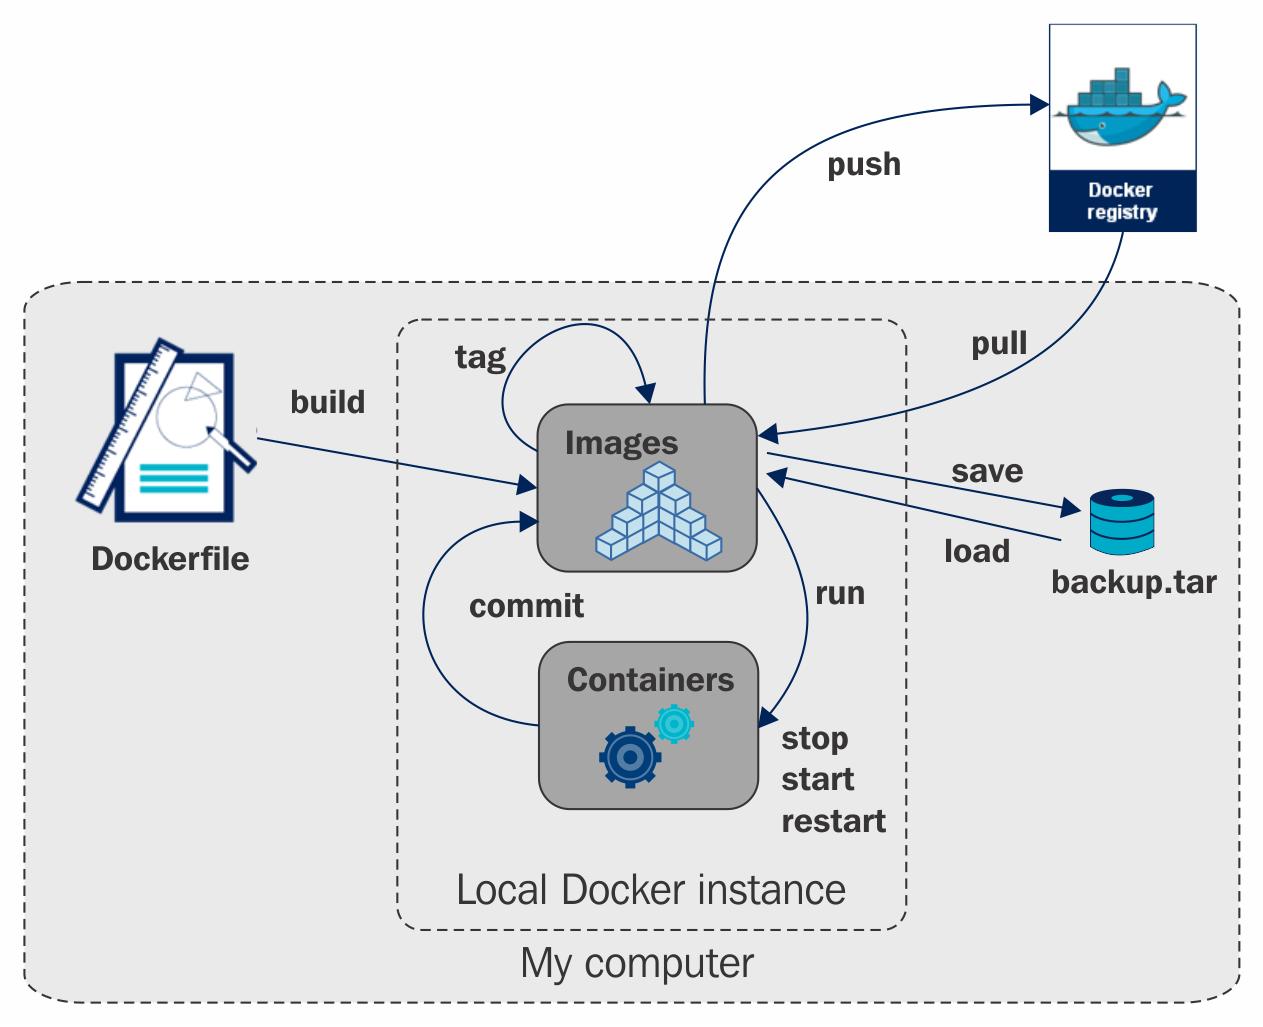 Managing Docker Images with Ansible - Implementing DevOps